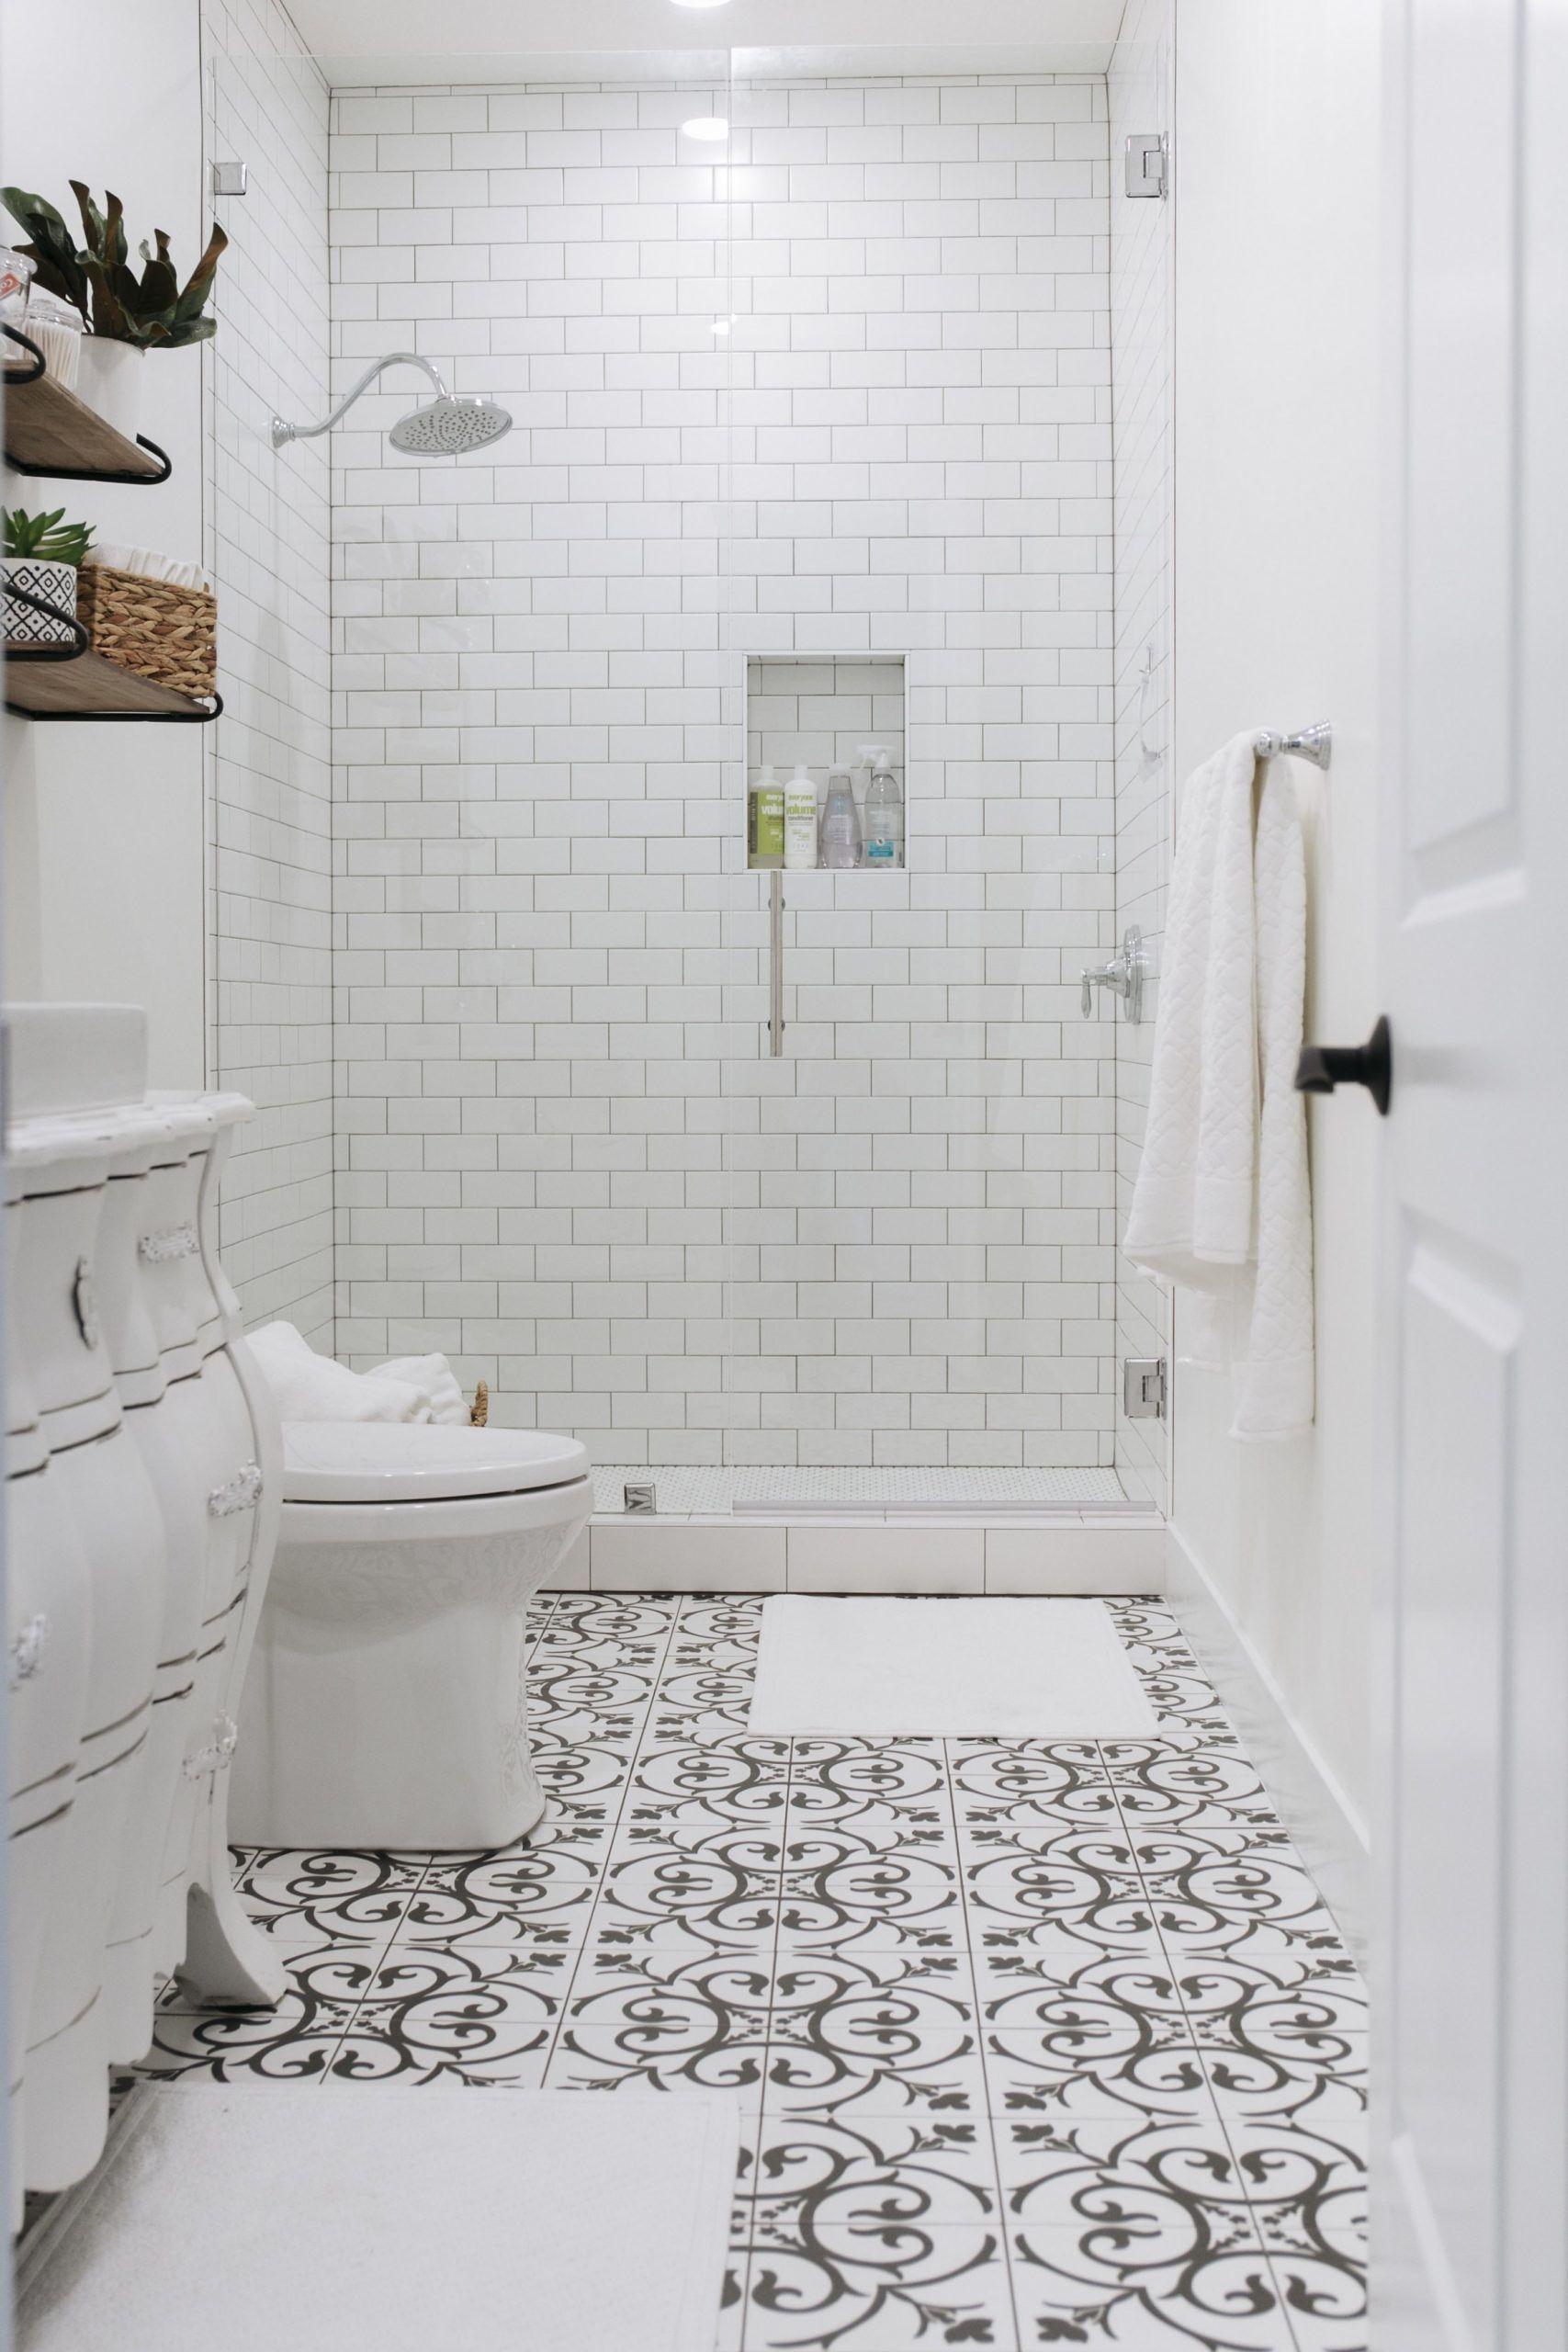 Guest Bathroom Floor Tile Ideas In 2020 Black And White Tiles Bathroom White Bathroom Tiles Tile Bathroom